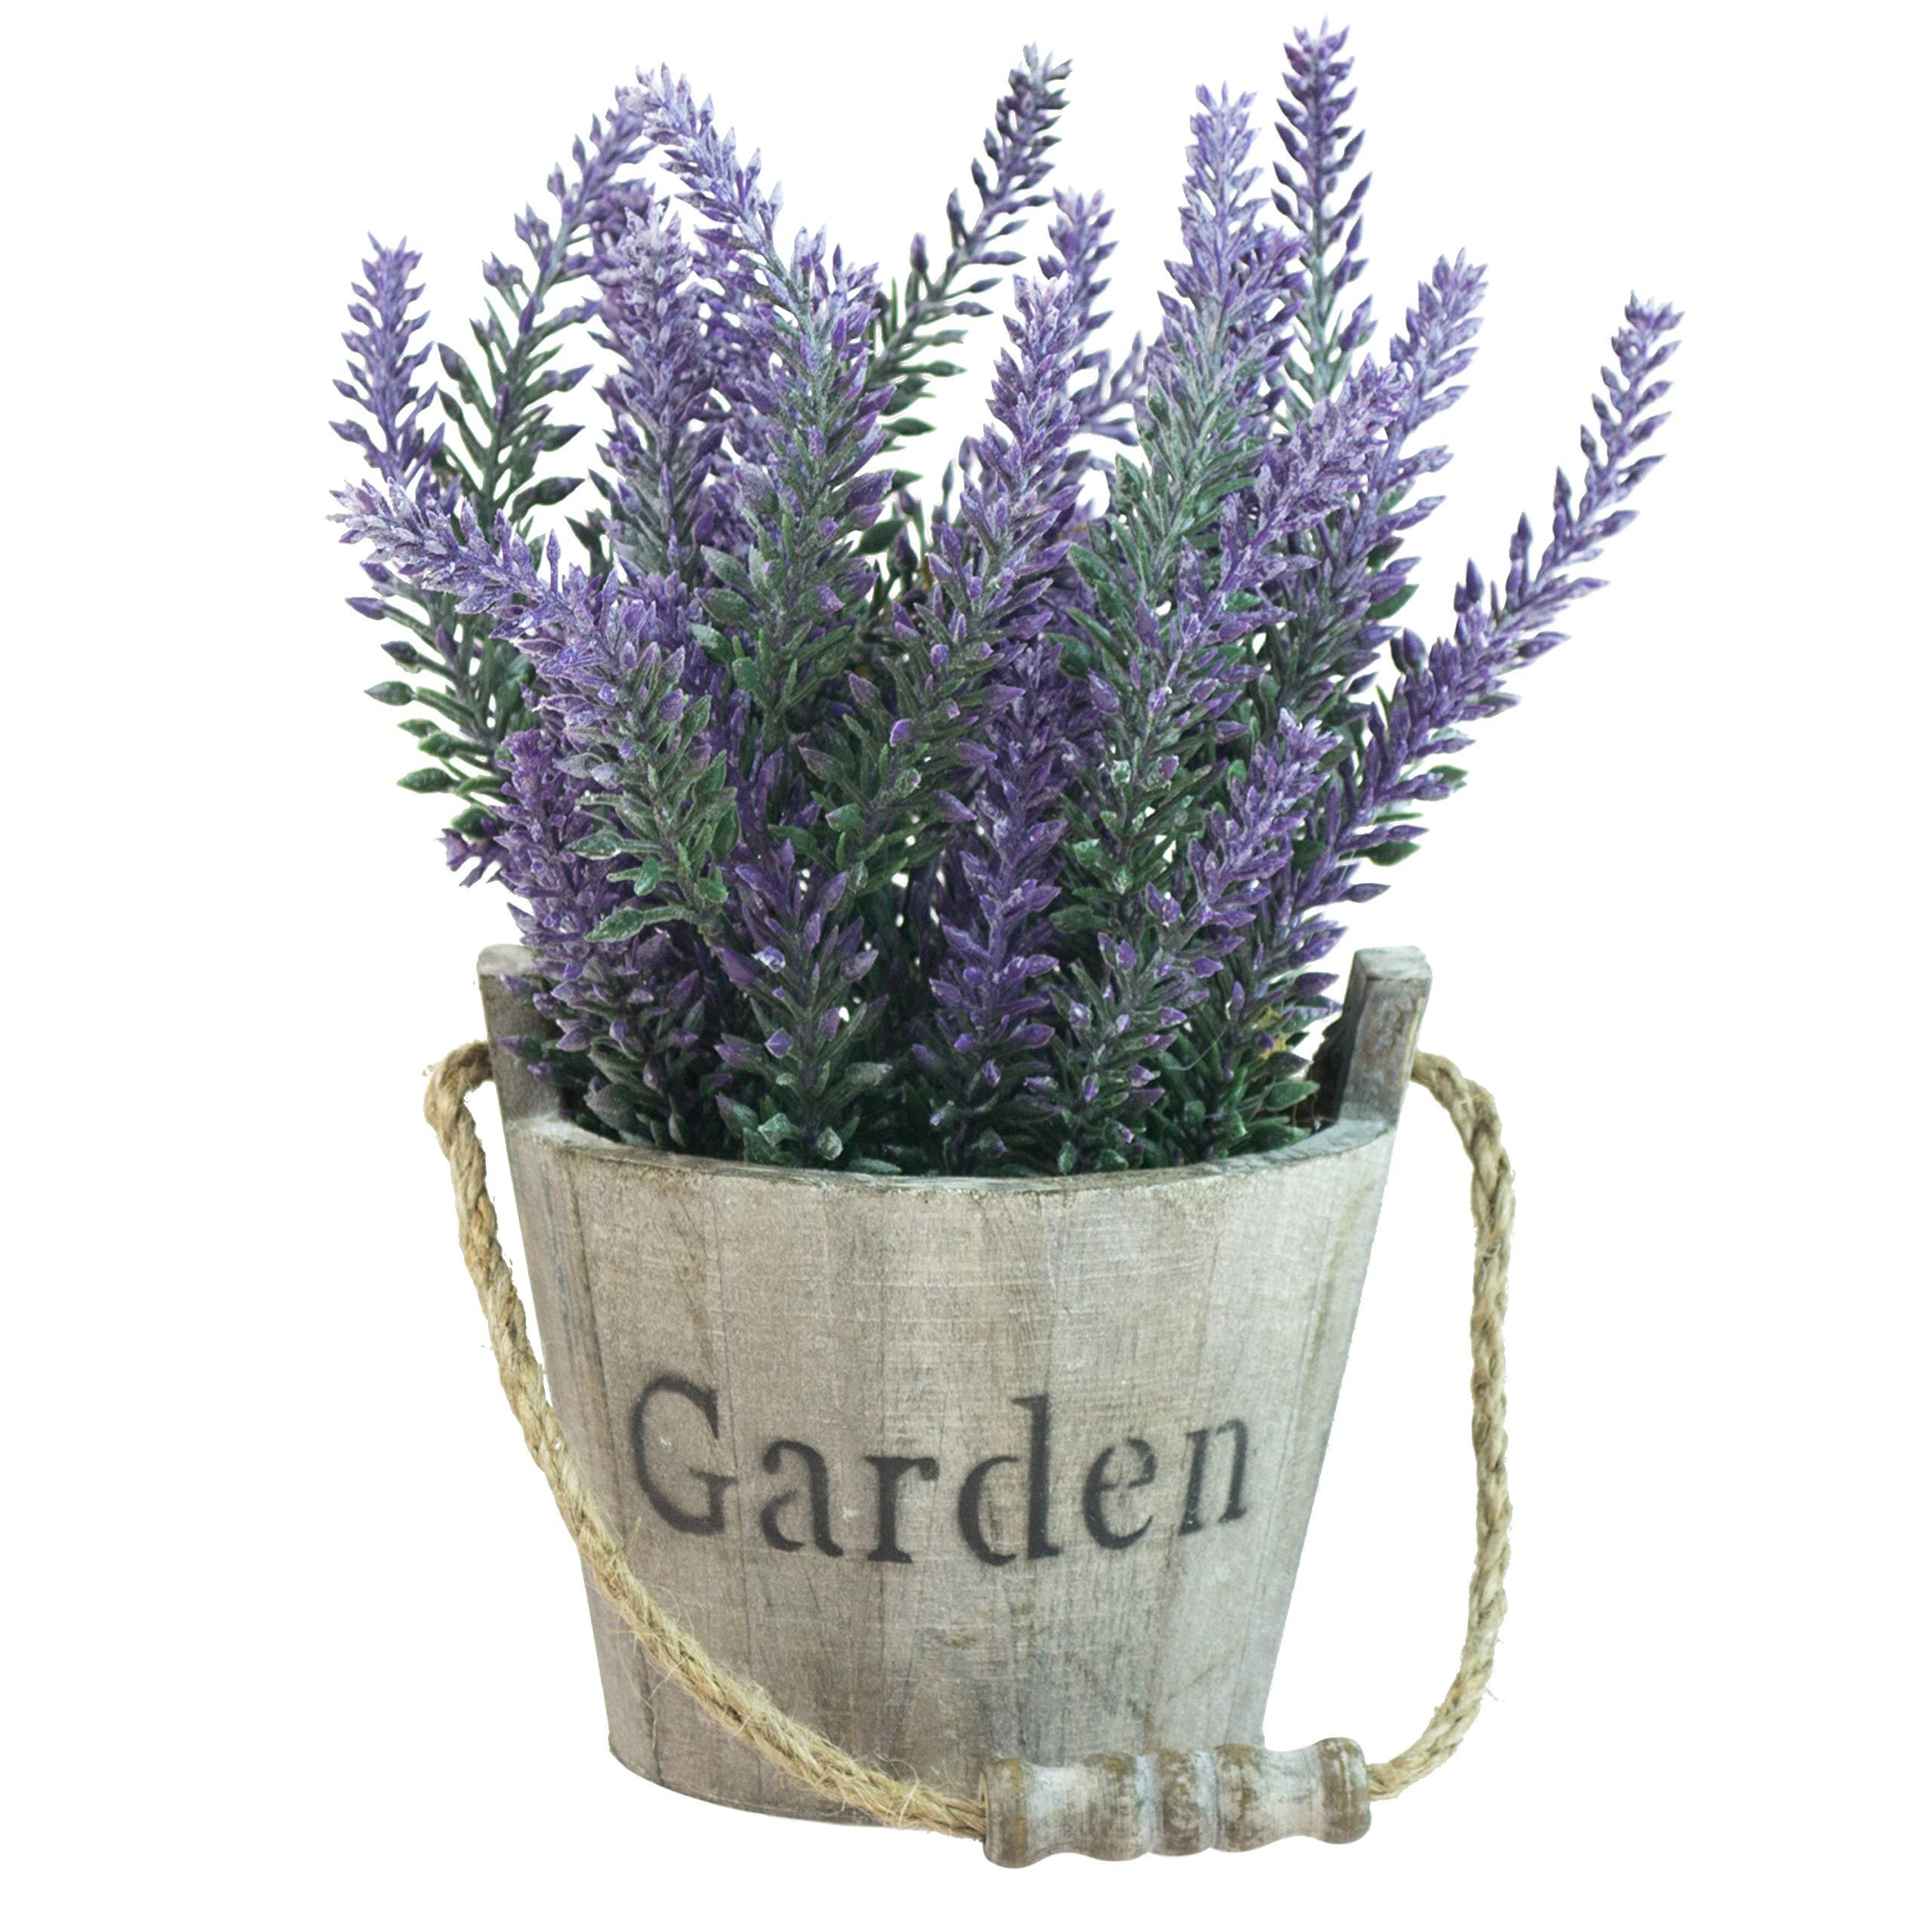 MyGift Artificial Lavender Plant, Faux Flower in Rustic Wood Garden Bucket Planter Pot, Brown